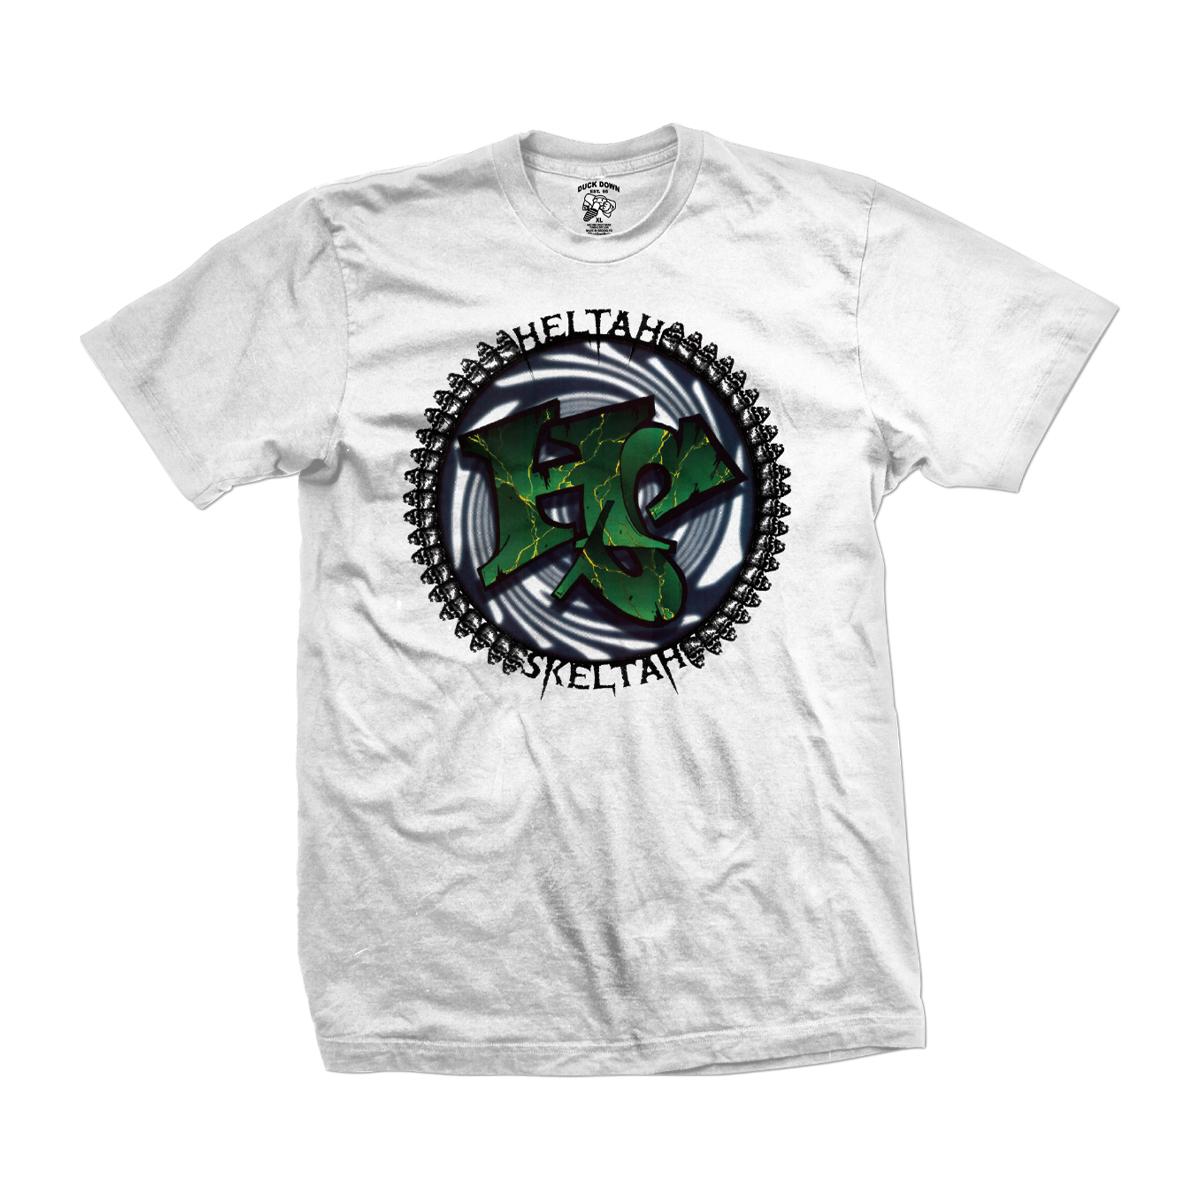 Heltah Skeltah Glow in the Dark Retro T-Shirt